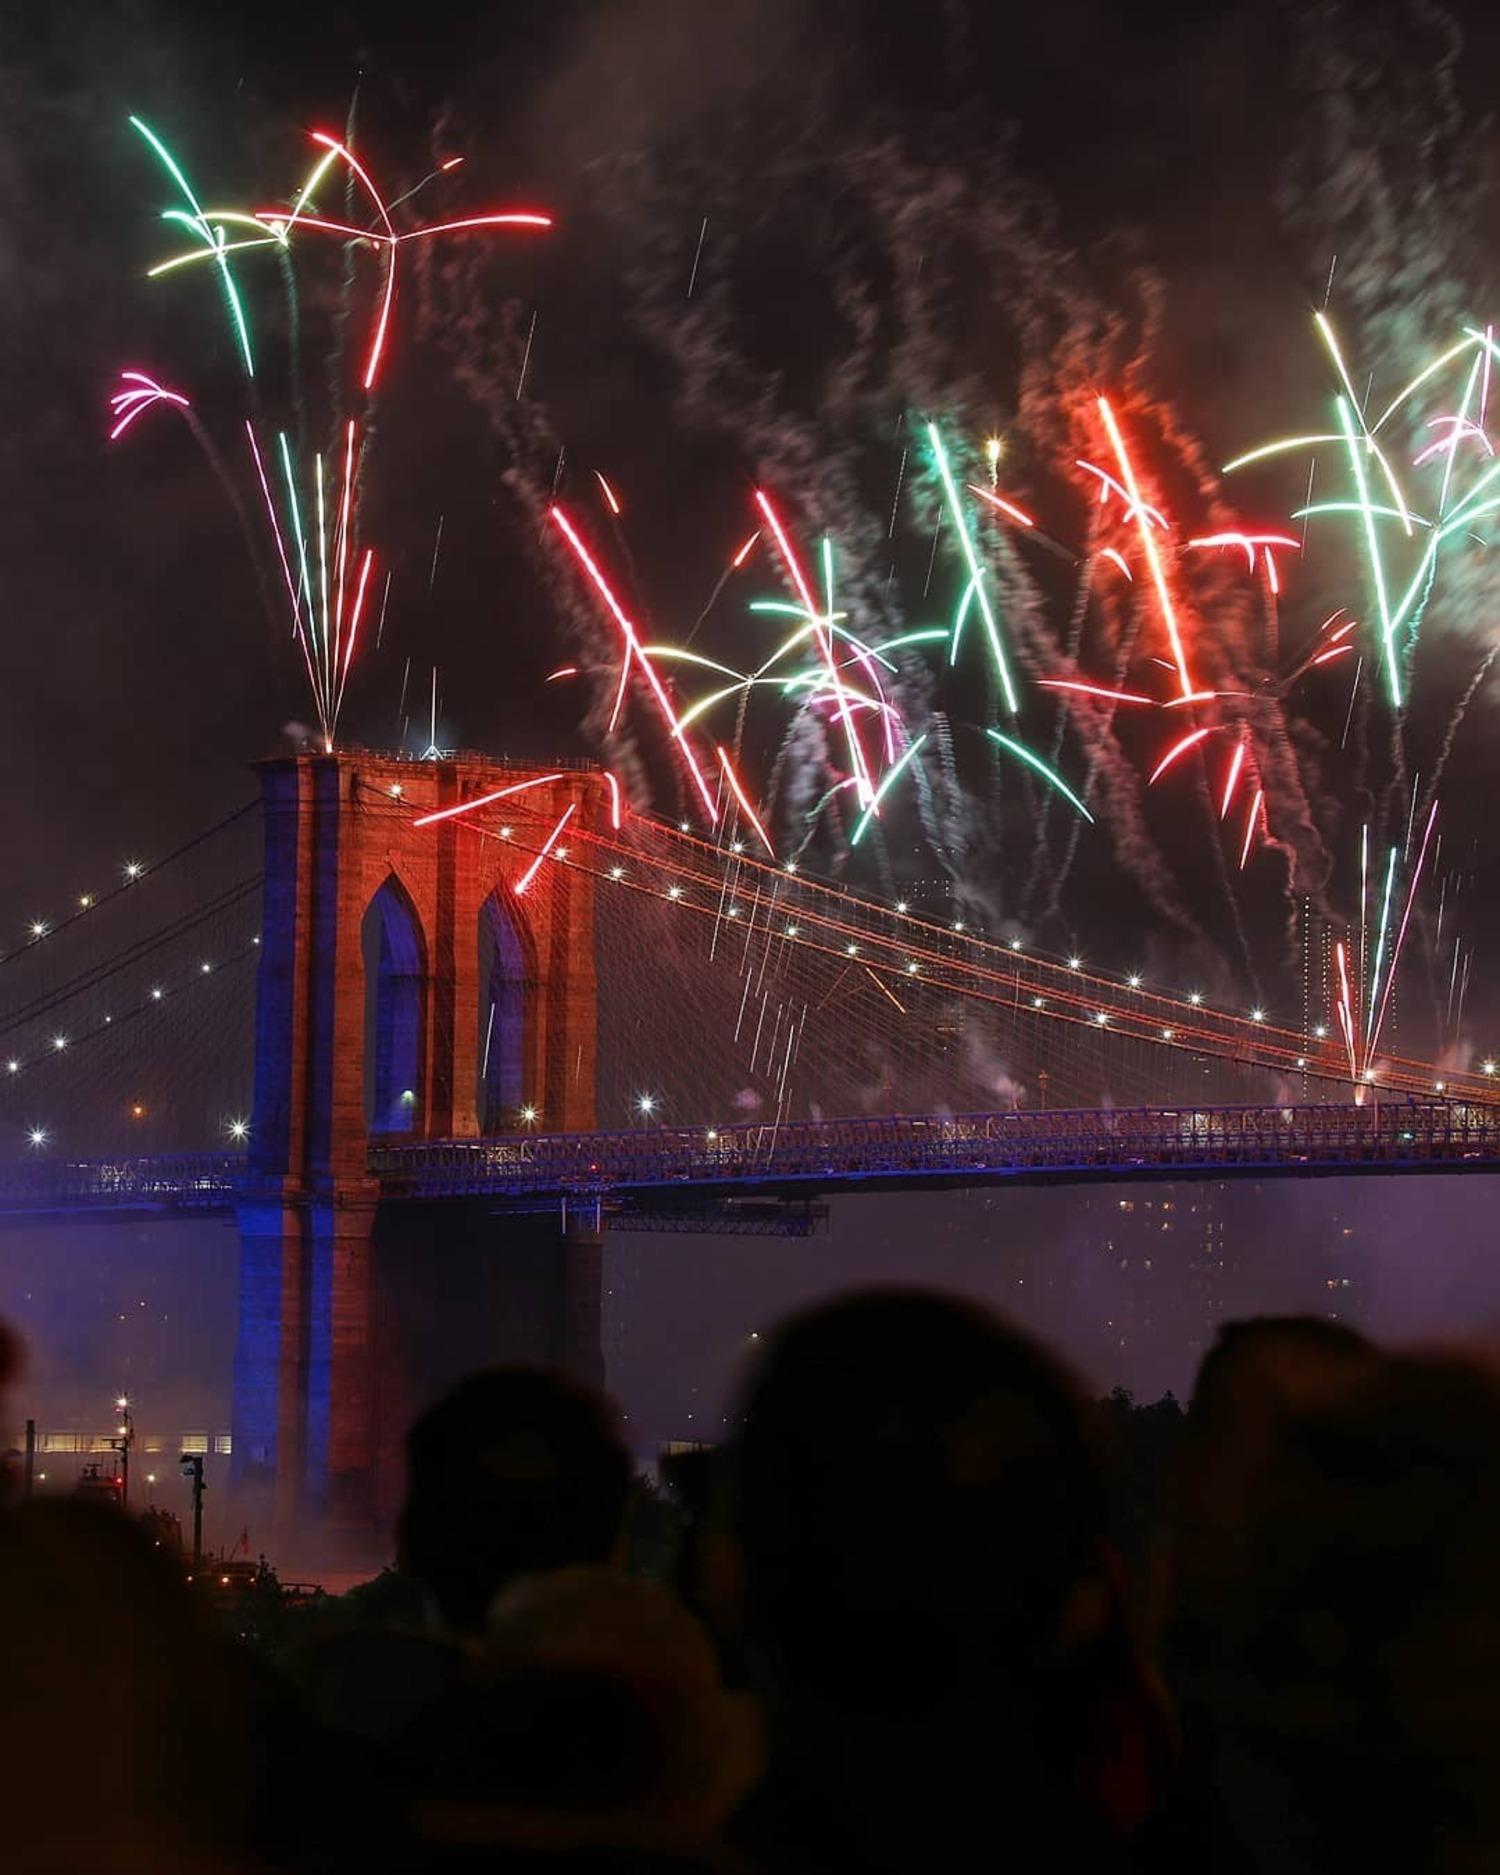 The 2019 Macy's 4th of July fireworks display over the Brooklyn Bridge